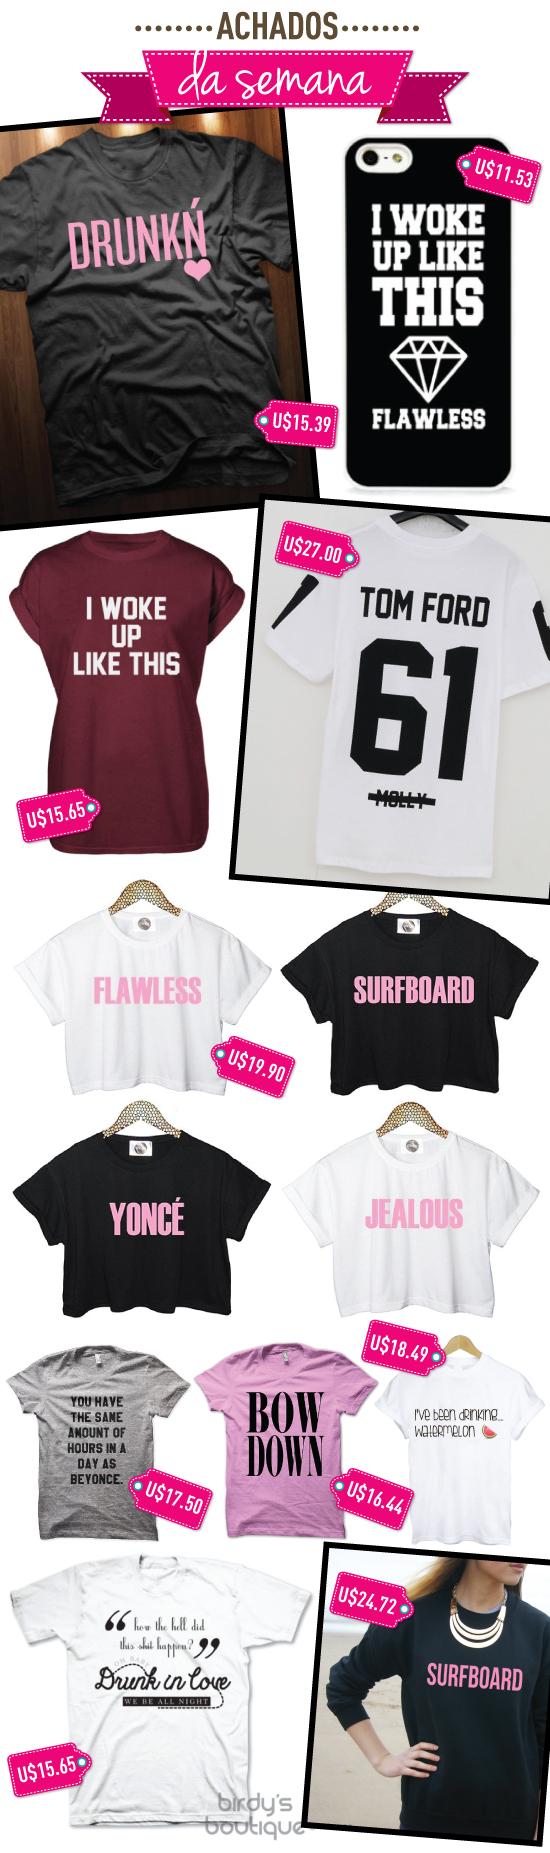 achados-da-semana-beyonce-camisa-camiseta-t-shirt-tshirt-onde-encontrar-ebay-vendedor-etsy-estampada-frase-yonce-flawless-surfboard-jay-z-jayz-tom-ford-molly-61-i-woke-up-like-this-capa-celular-bow-down-drunk-in-love-cd